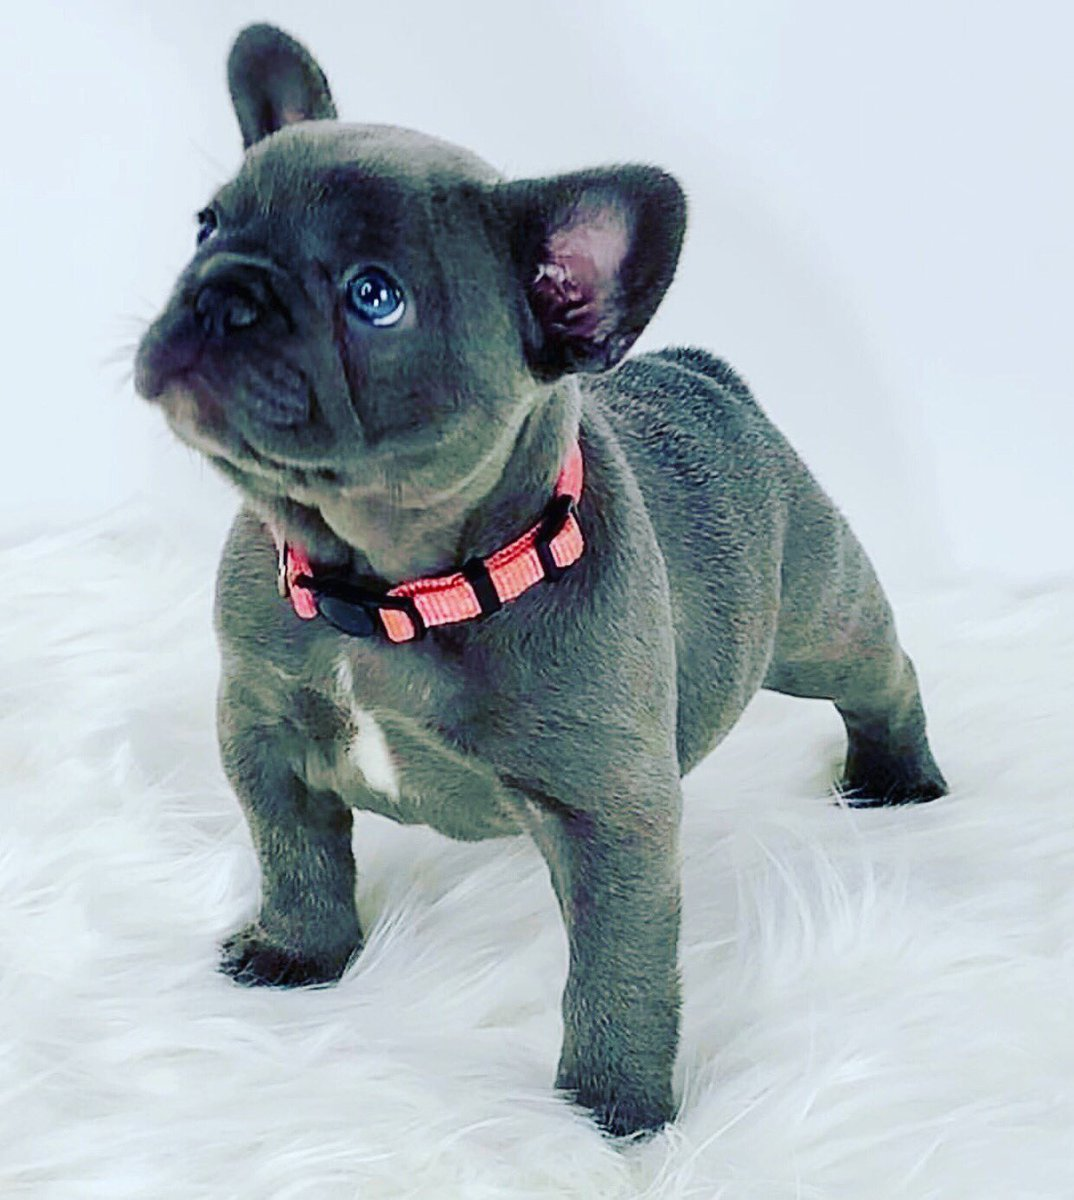 Just a perfect little girl!  @oakleybfrenchie #Frenchie #frenchbulldog #frenchbulldogs #dog #DogLover #dogsofinstagram #puppy #Puppies #puppylove #CutePuppies #cutebaby #animals #Bulldogs #bulldog #Adorable #cute #CutenessOverload #perfect @itsdougthepug<br>http://pic.twitter.com/azXvAnnBfH